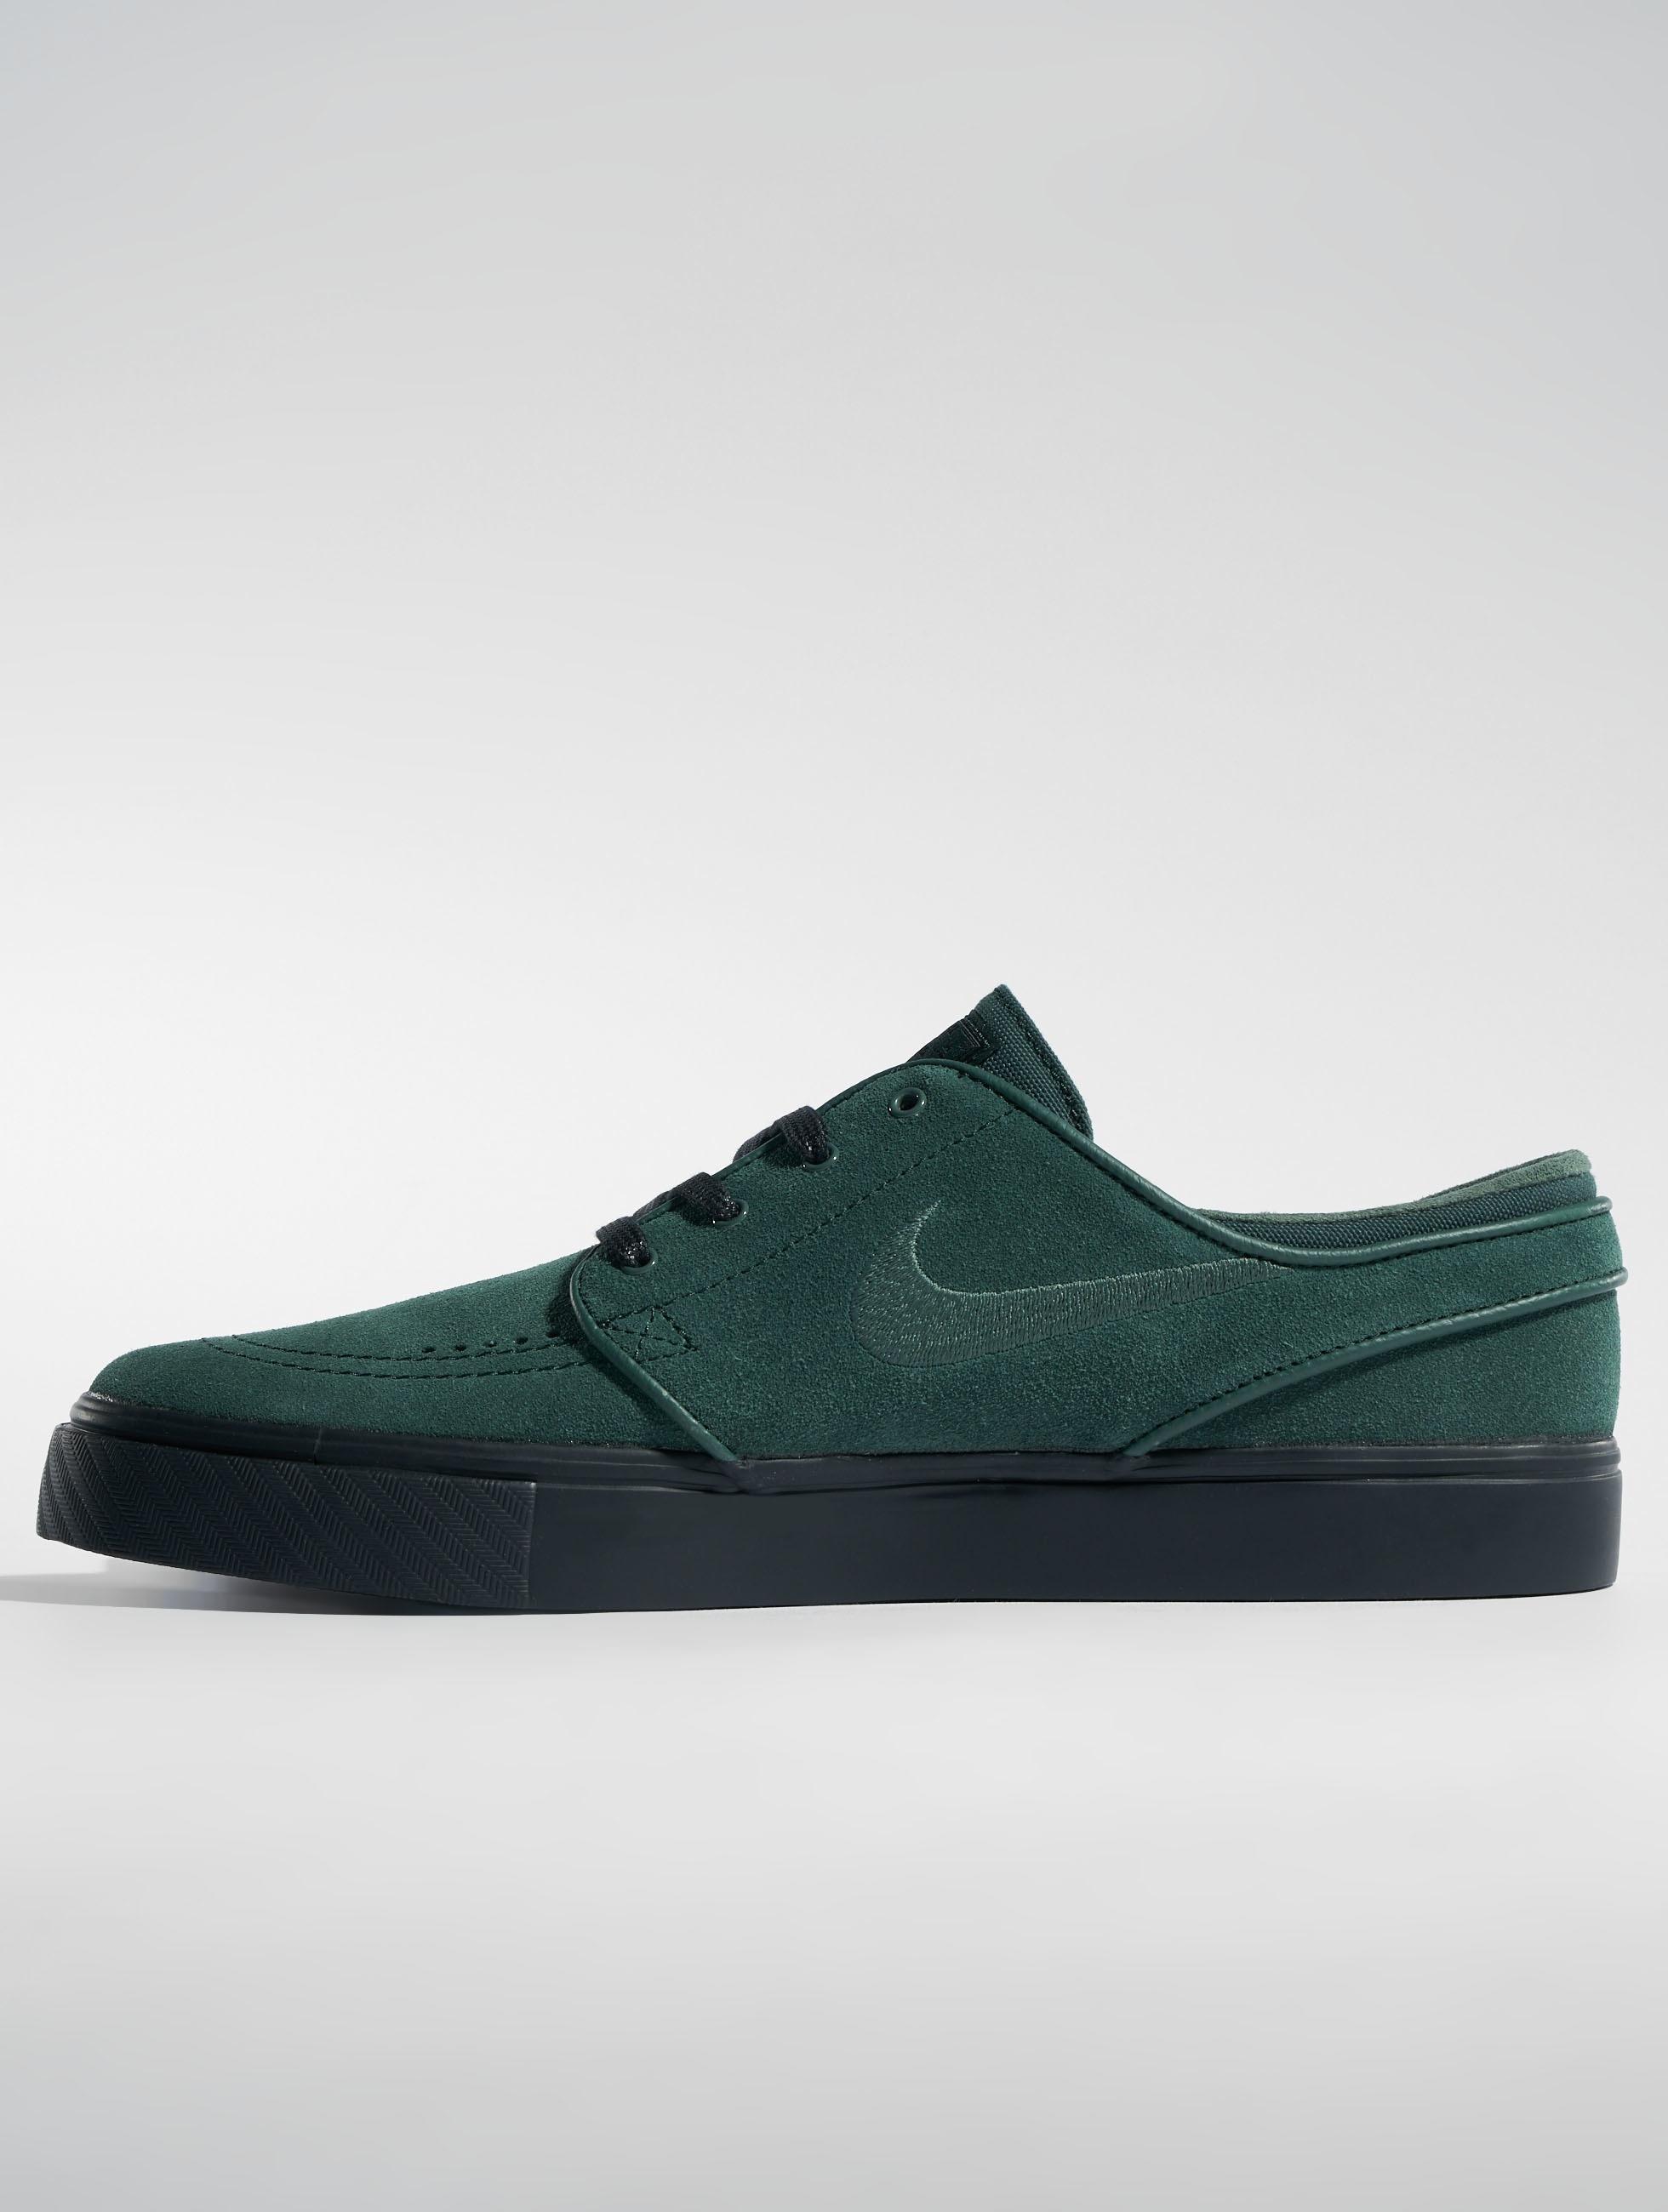 outlet store b75a2 aeab2 Nike SB Kengät   SB Zoom Stefan Janoski Tennarit   vihreä 500684